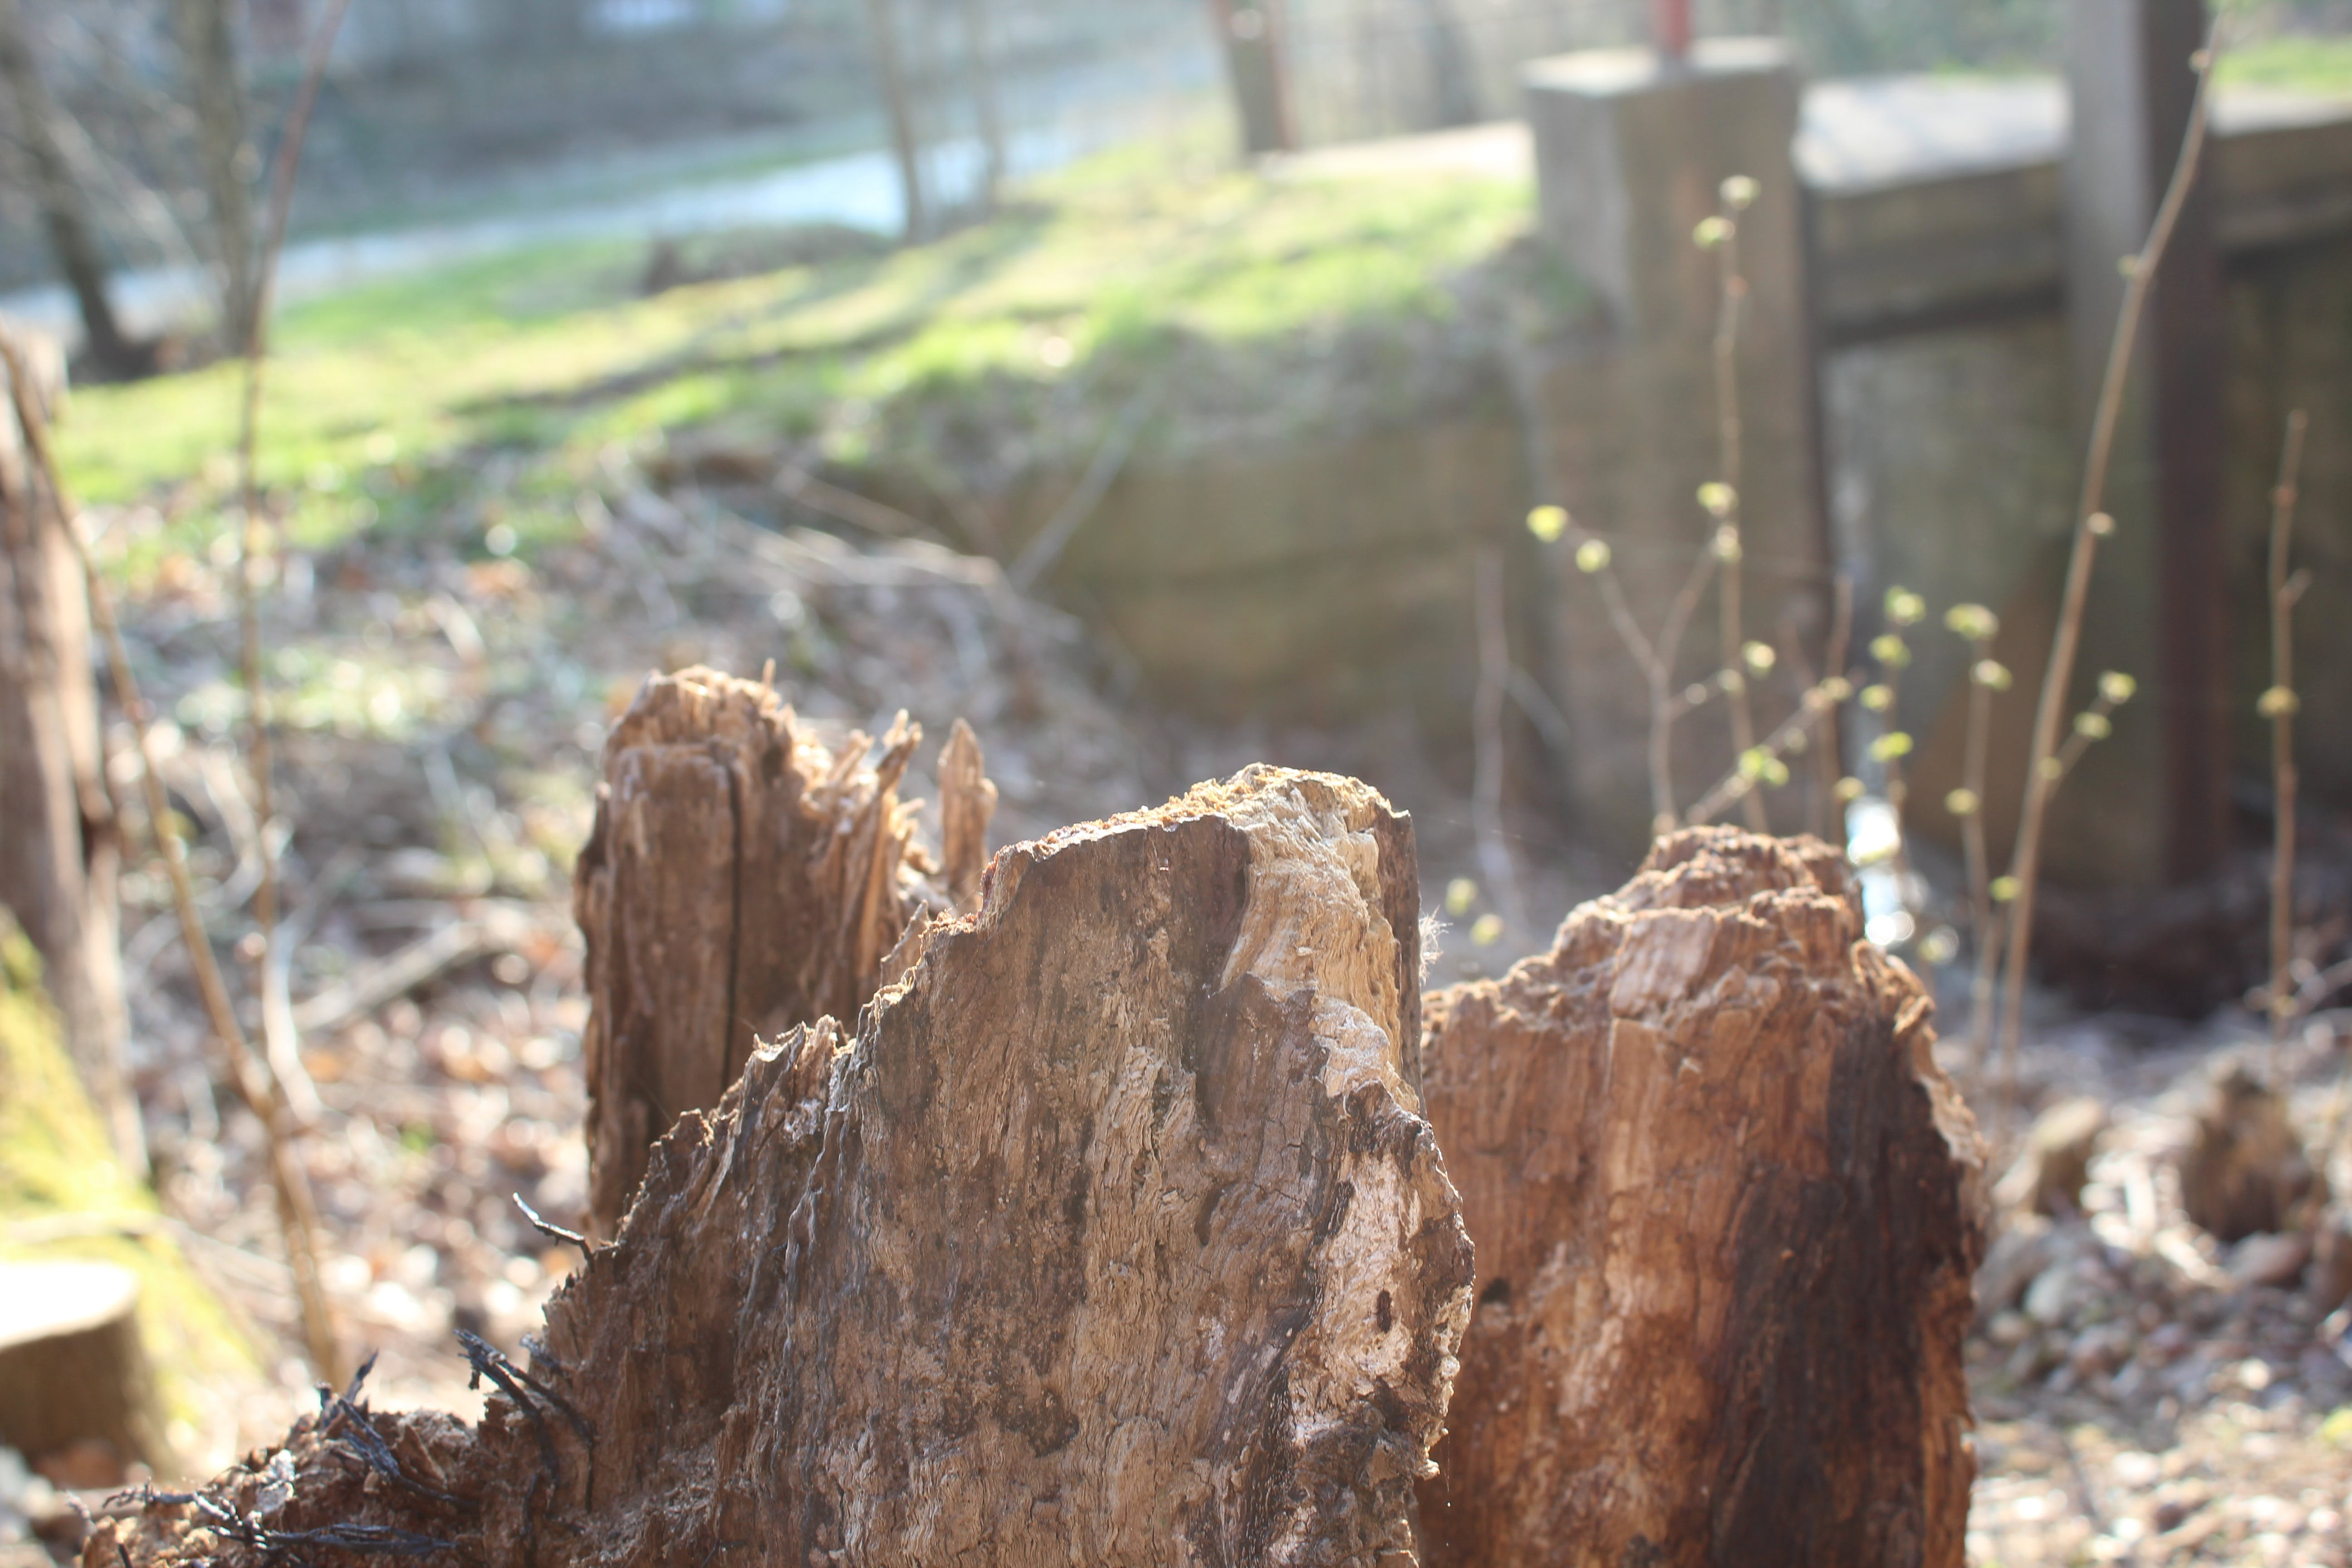 dřevo, příroda, příroda tapeta